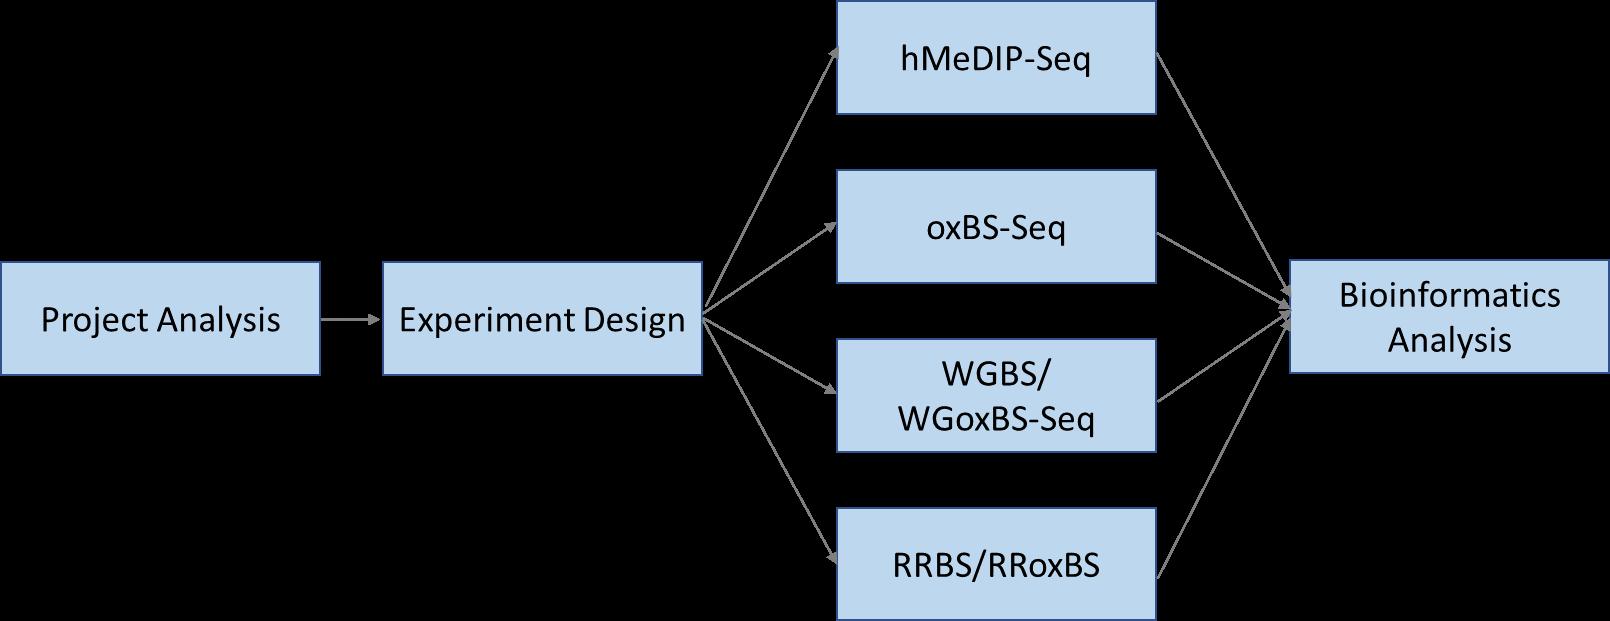 5mC/5hmC Sequencing Workflow